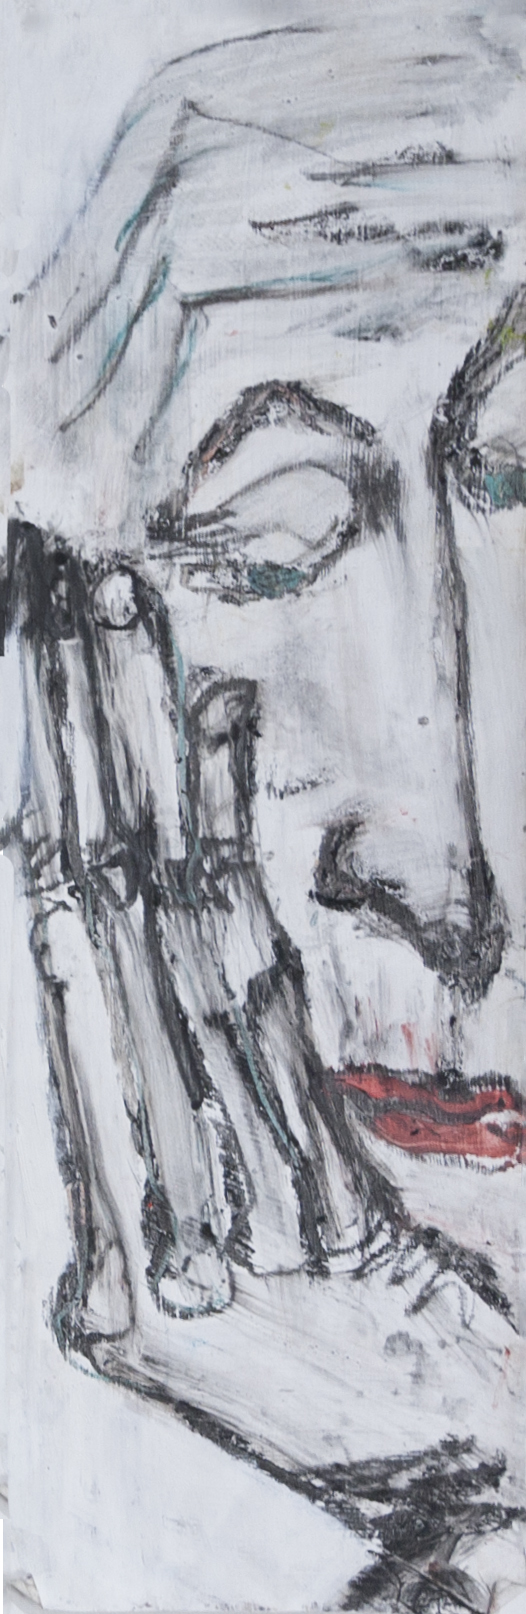 "Nancy Rosen 6""x18"" Mixed media on paper"